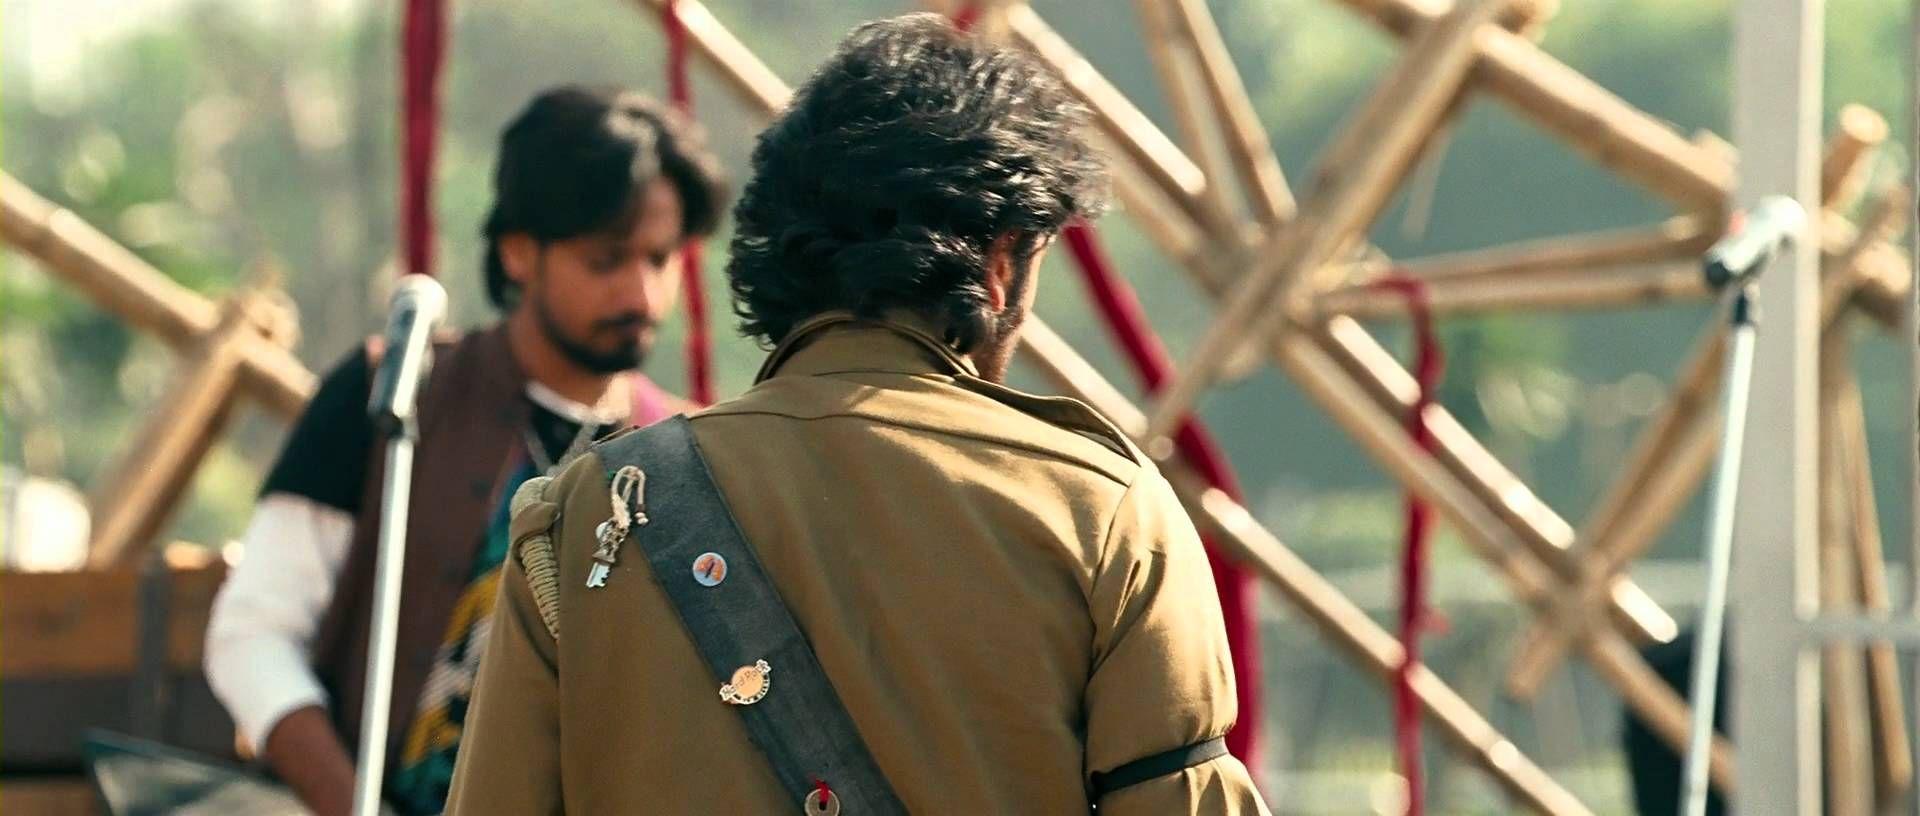 Sadda Haq (HD) Rockstar Full Song | 1080p BluRay | fill up my soul